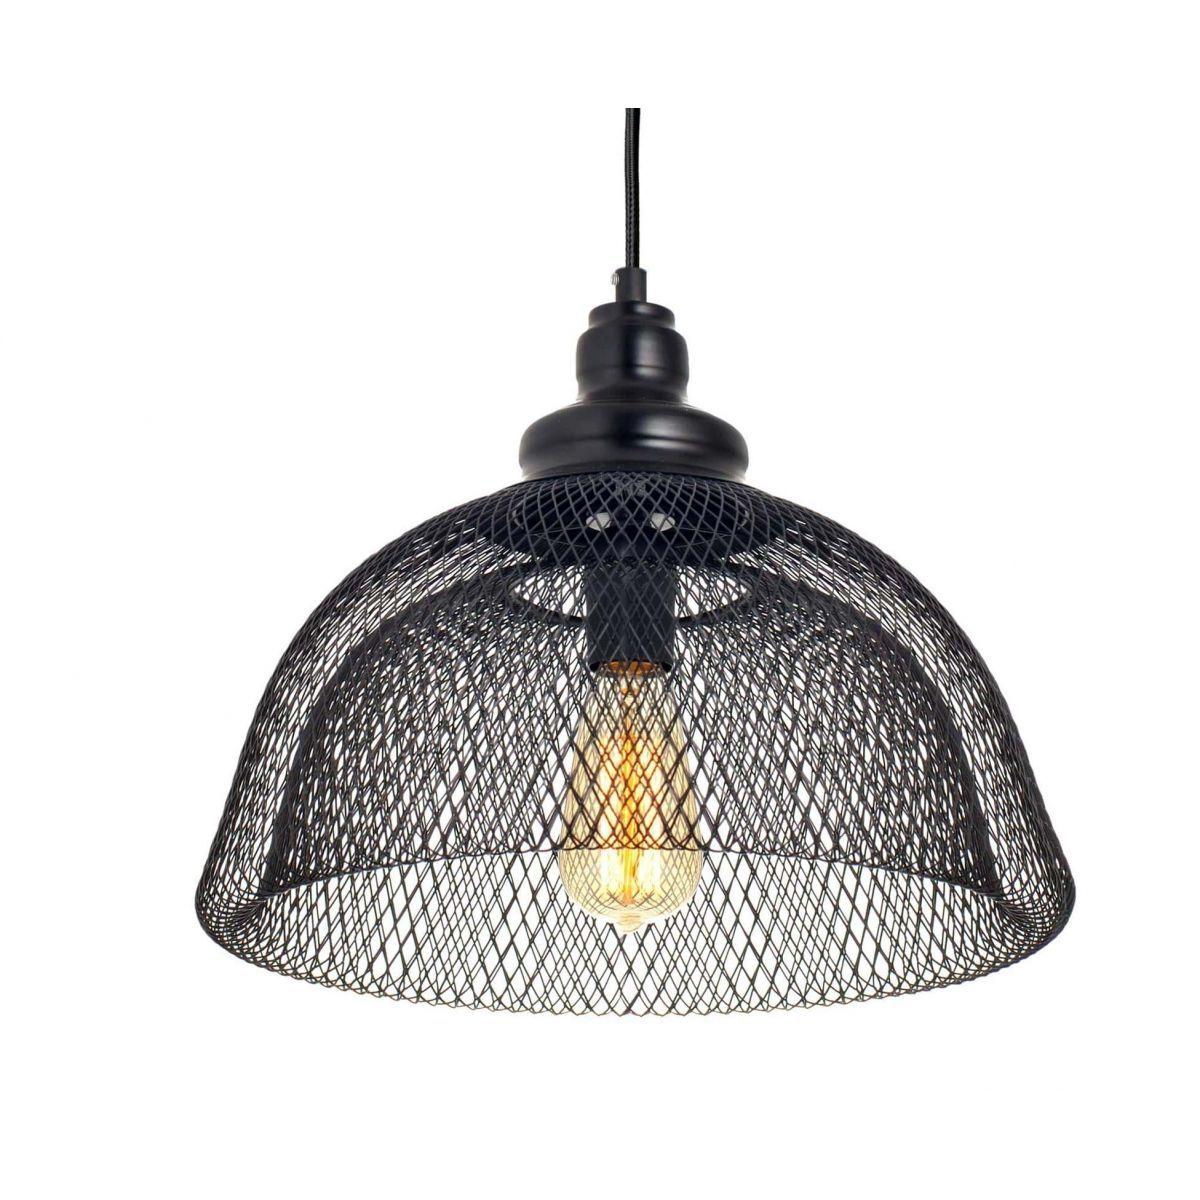 Luminária Pendente Aramado Renda Cupi Preta Ref: Lt-171A-Pt - Luxtek